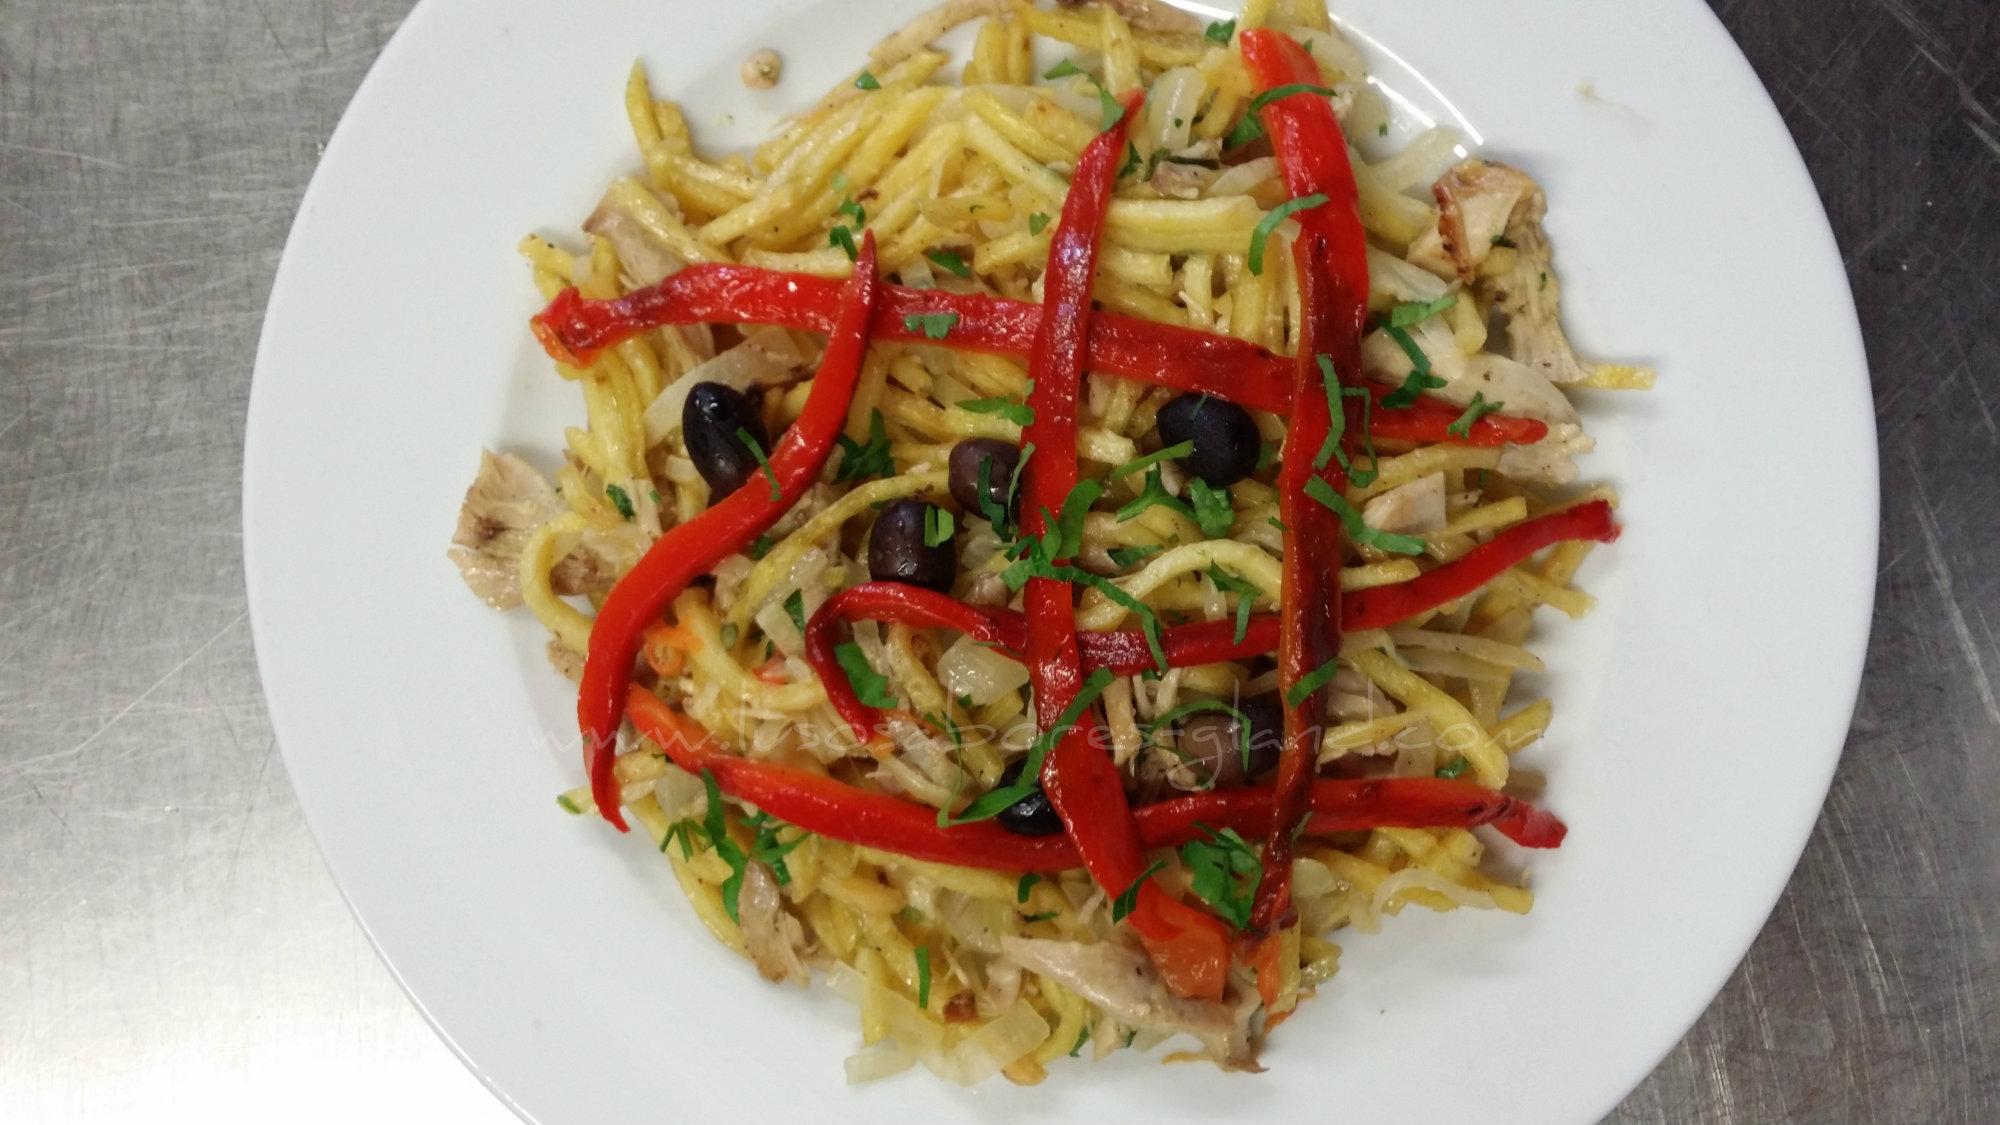 Restaurant LUSOSabores